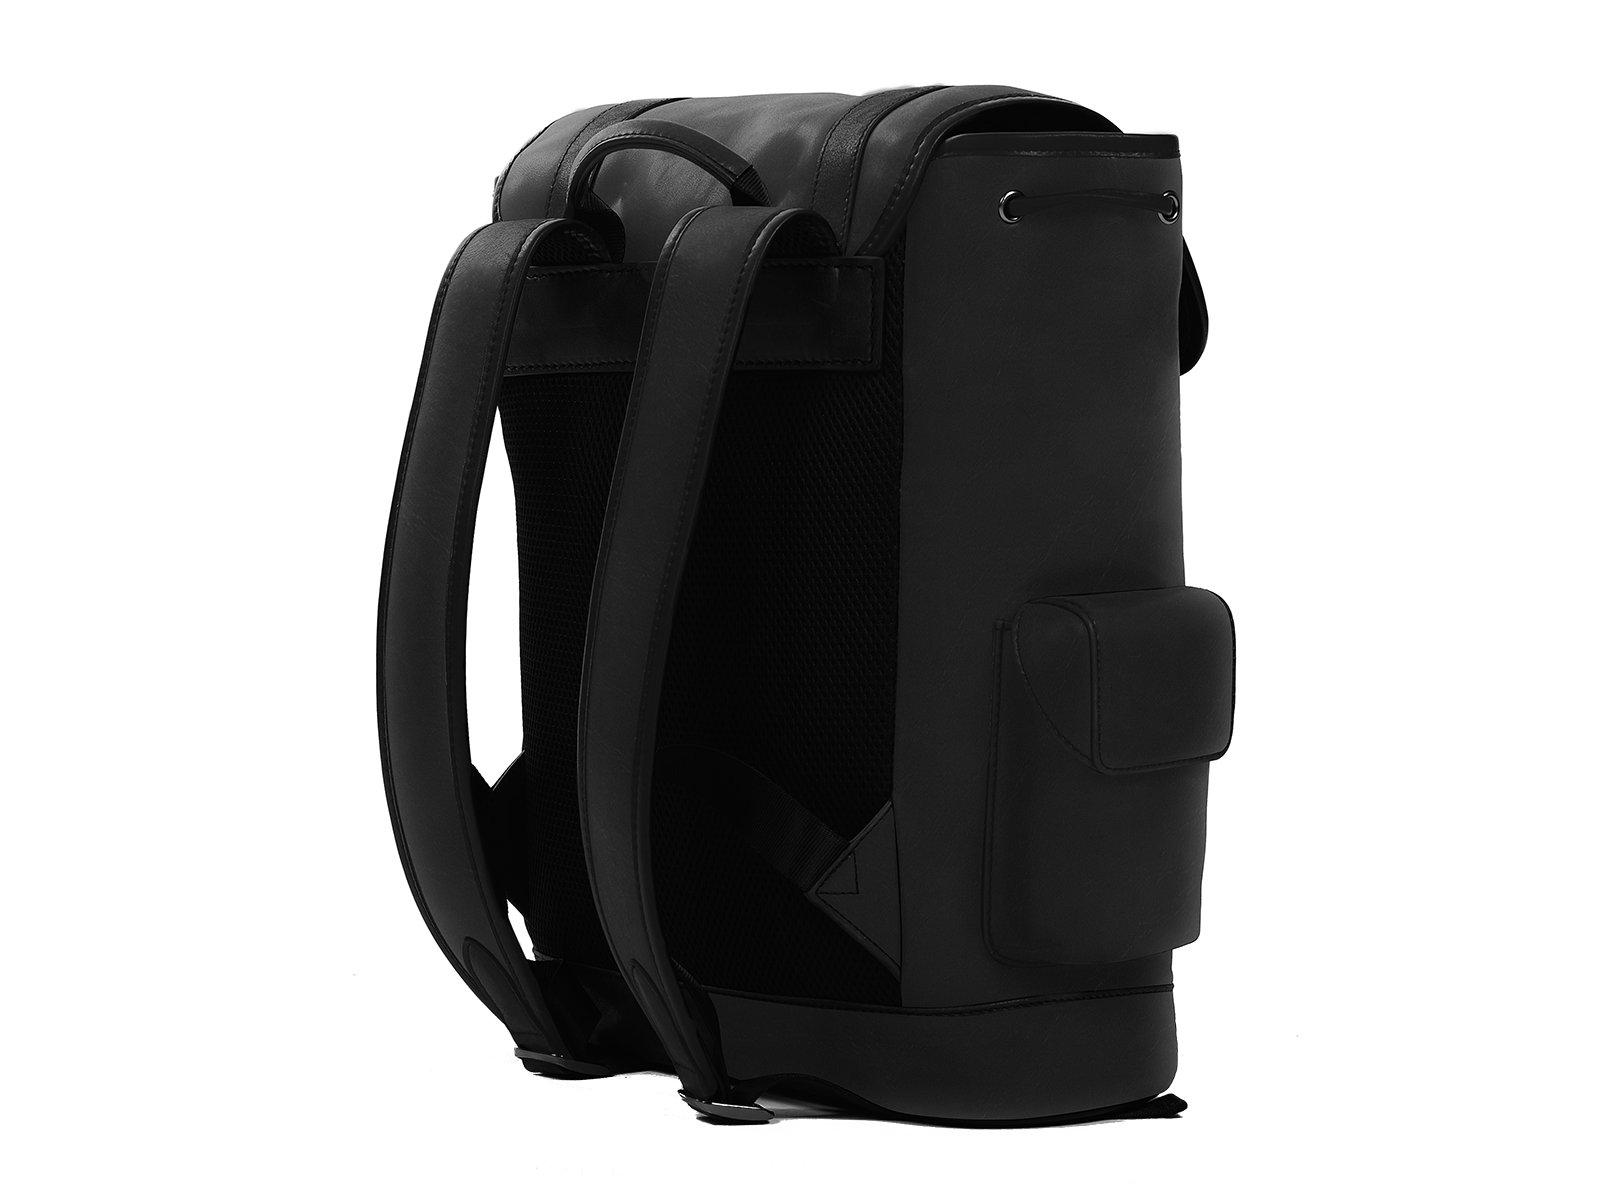 Kingshood leather backpack